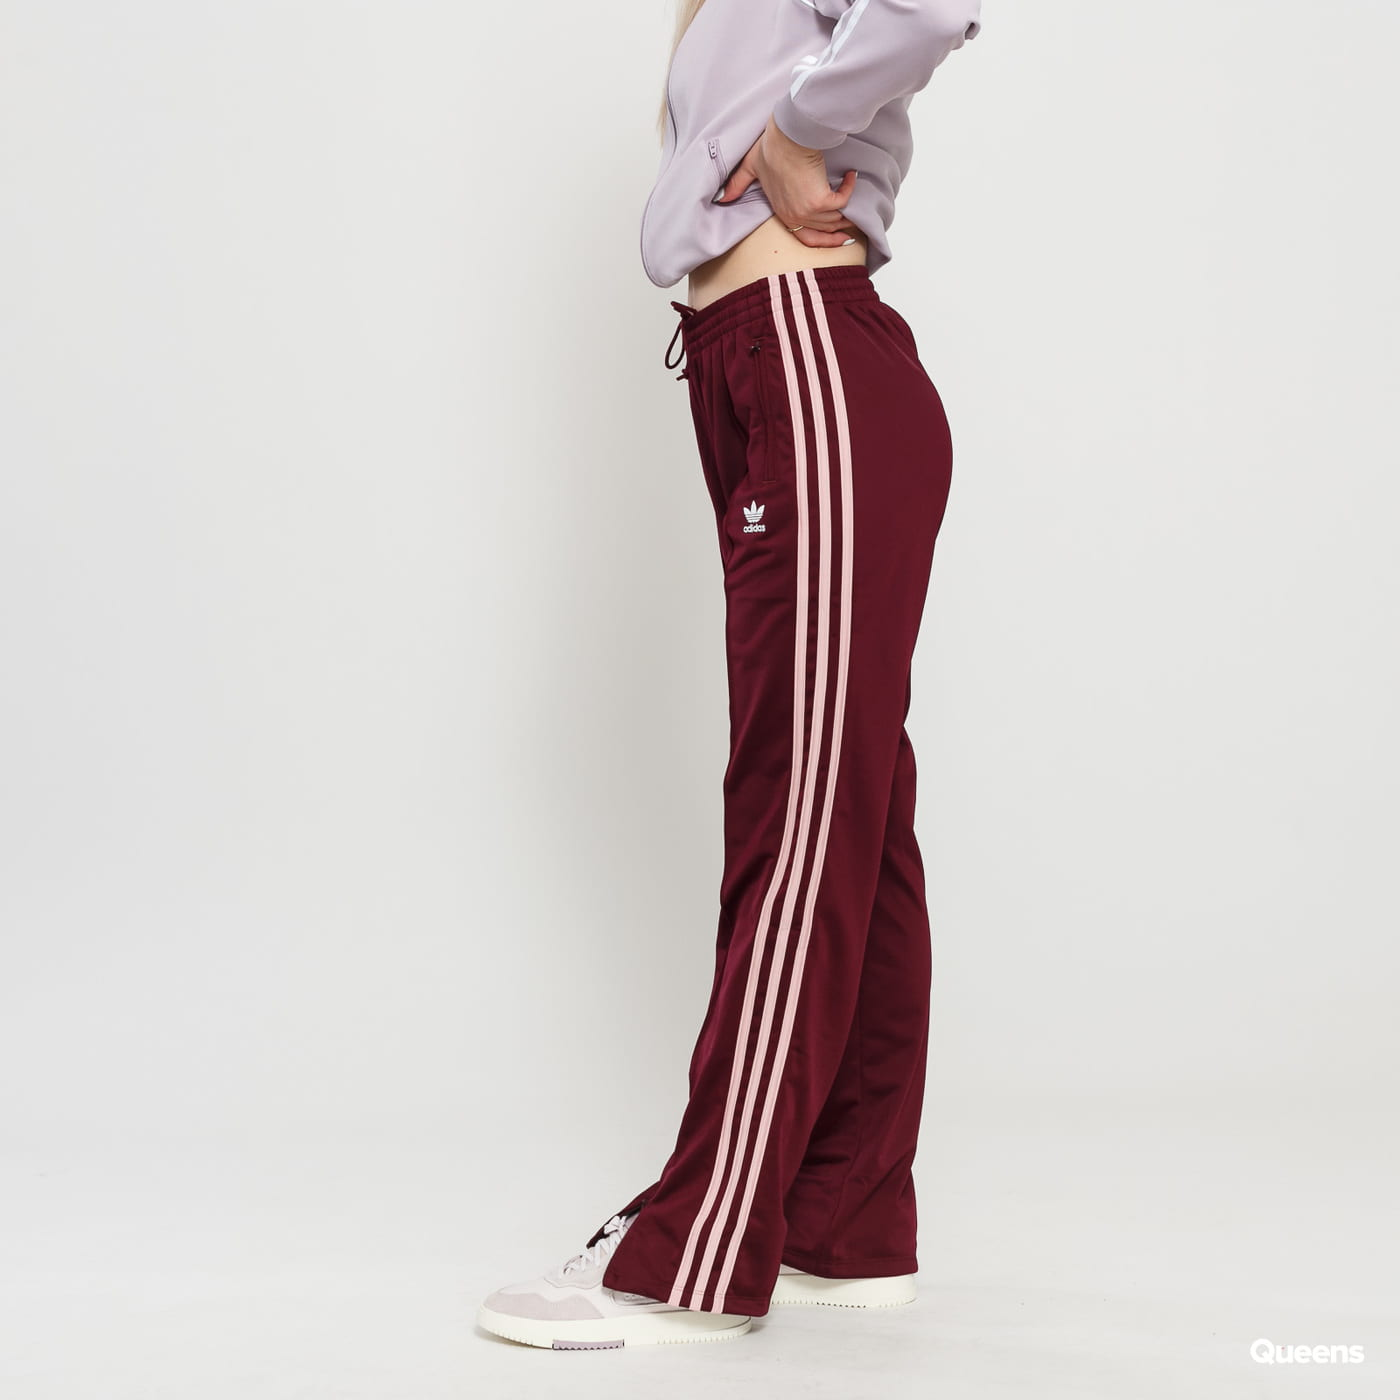 pazzo ex Infatti  Sweatpants adidas Originals Firebird Track Pant bordeaux (ED4791) – Queens  💚